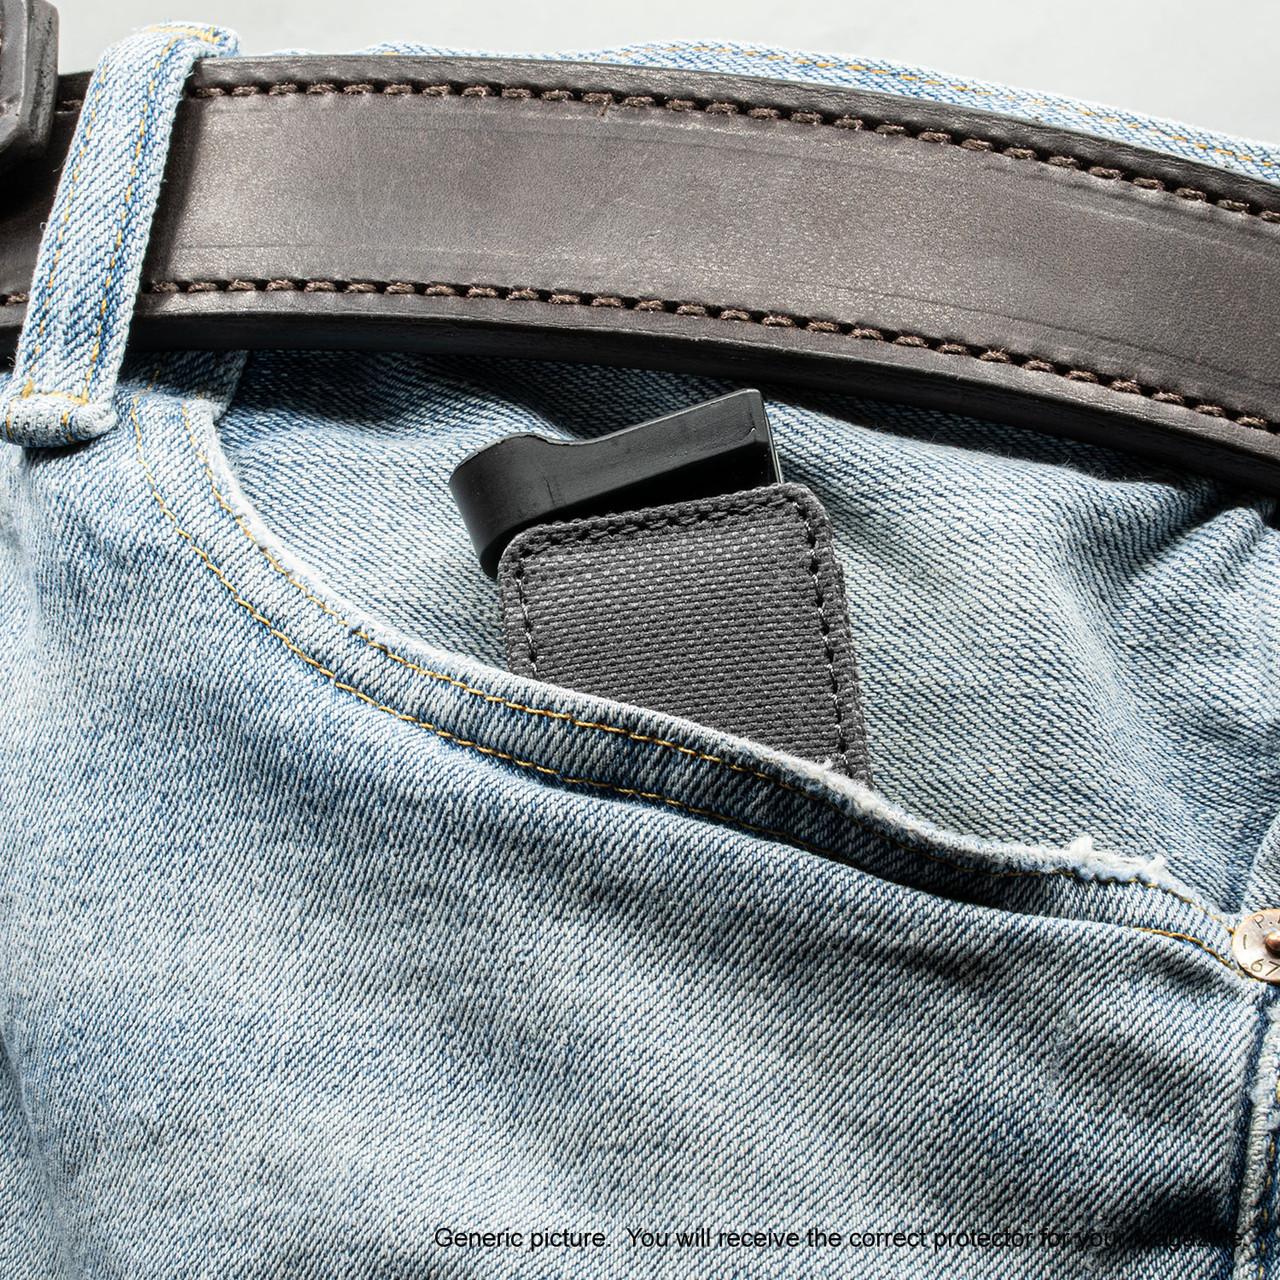 Remington R51 Grey Covert Magazine Pocket Protector